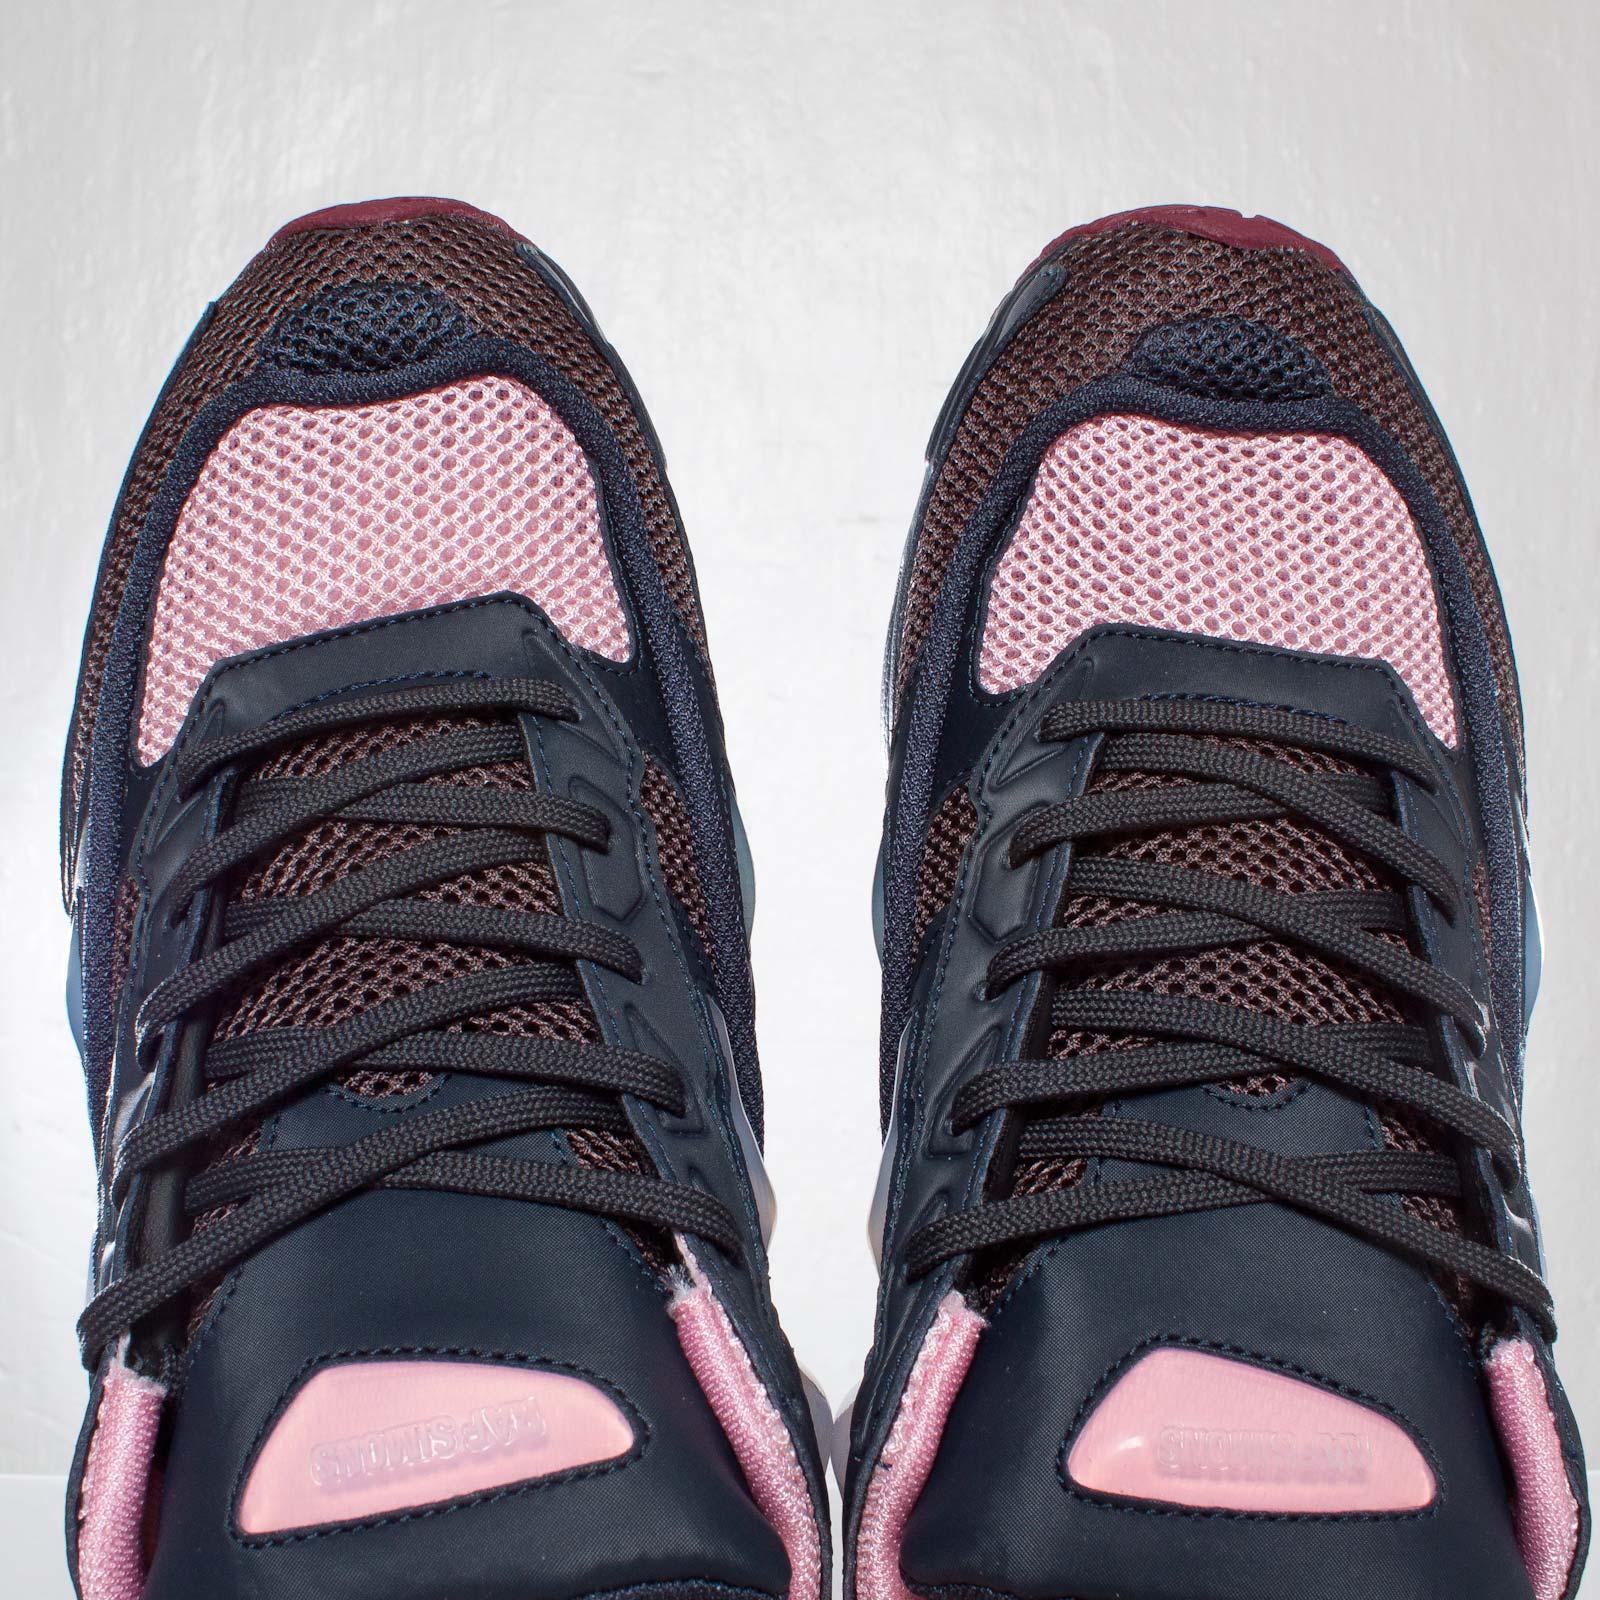 Order Cheap Nike Air Force 1 Sports Footwear for Men 75647